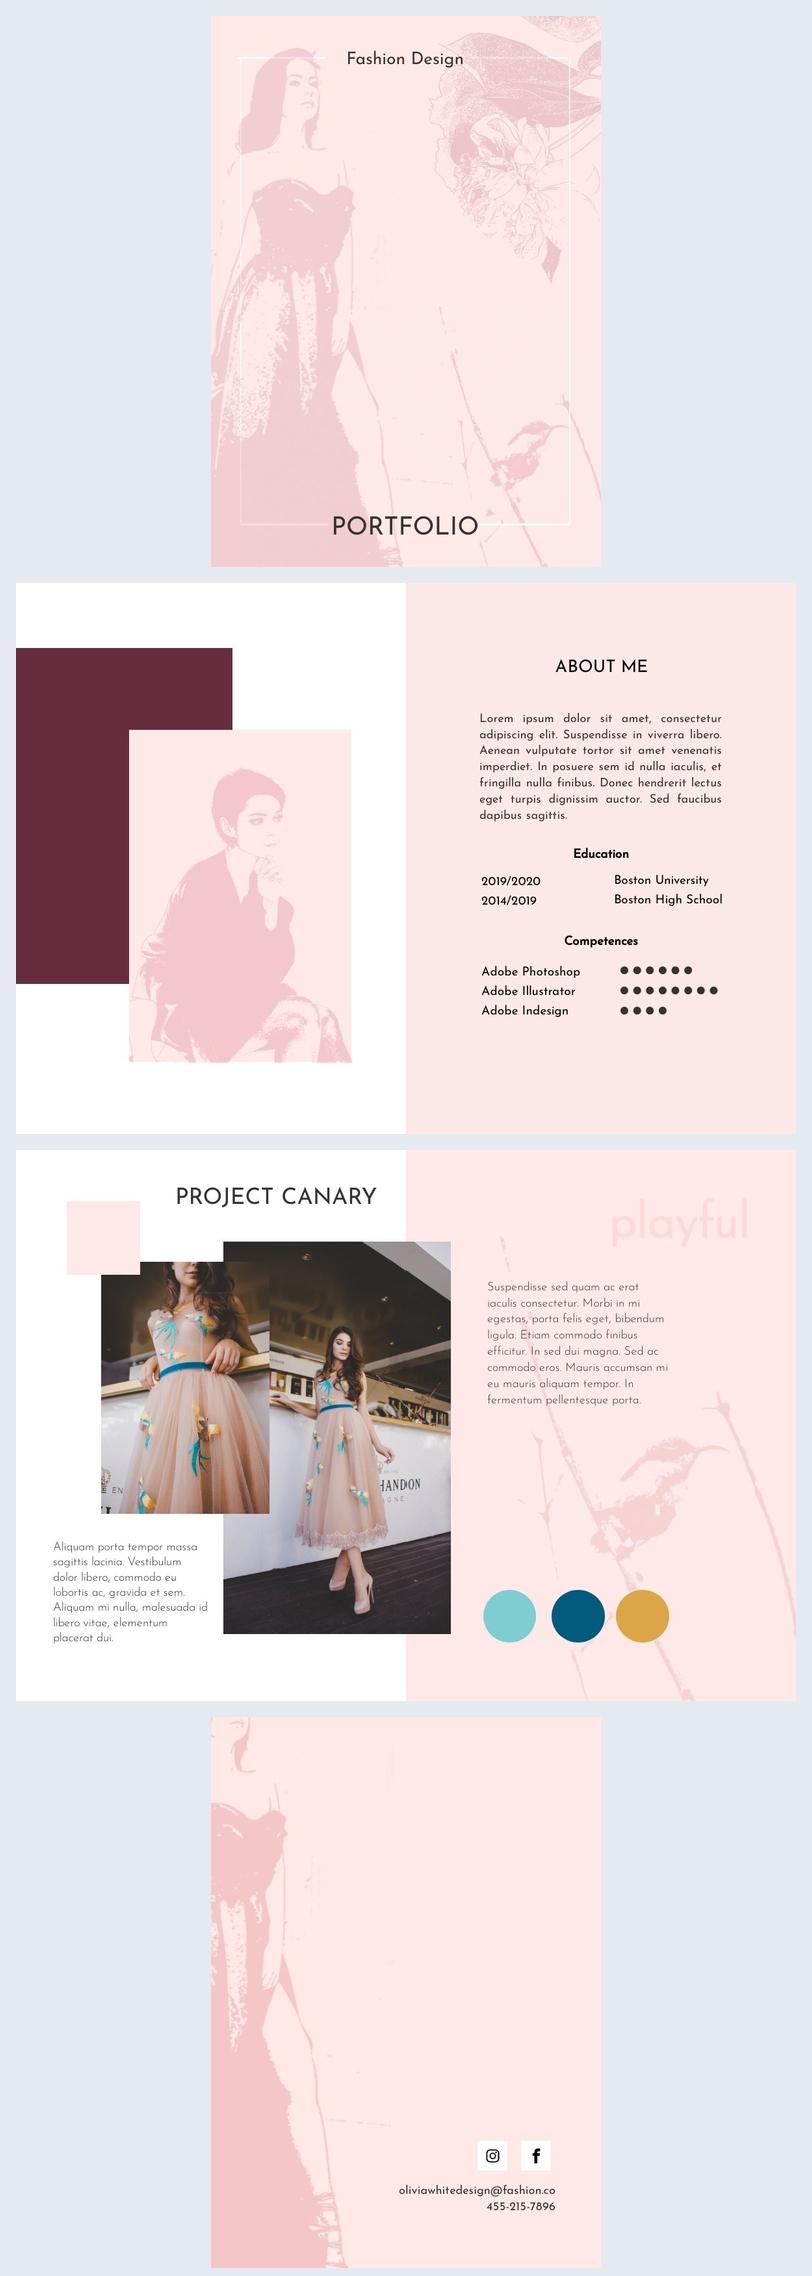 Portfolio of fashion design student layouts